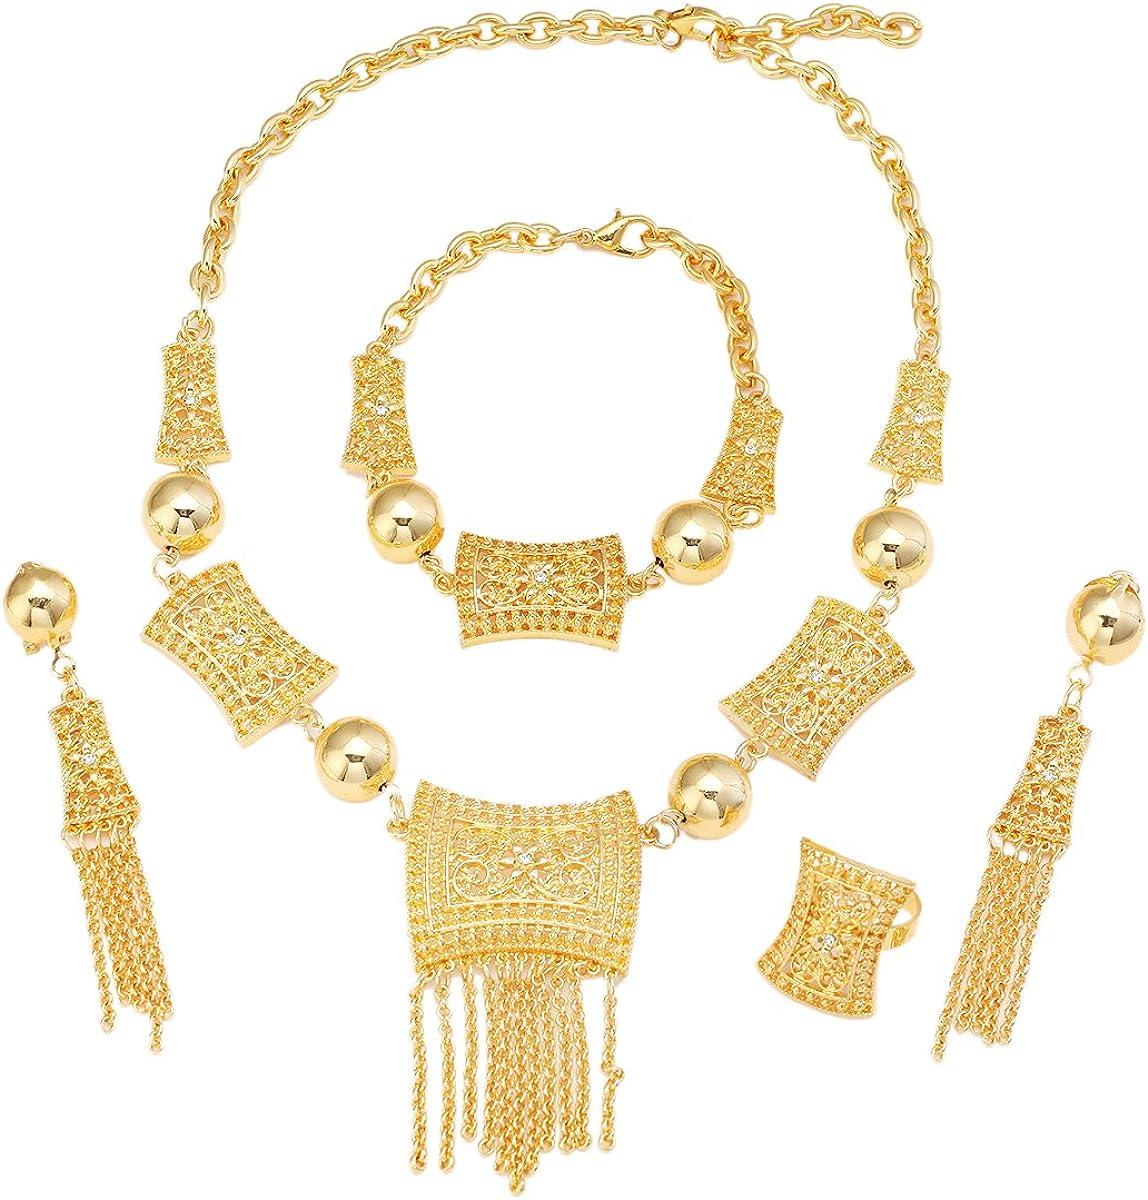 African Jewelry Set 24K Gold Ethiopian India Dubai Gold Bride Jewelry Set